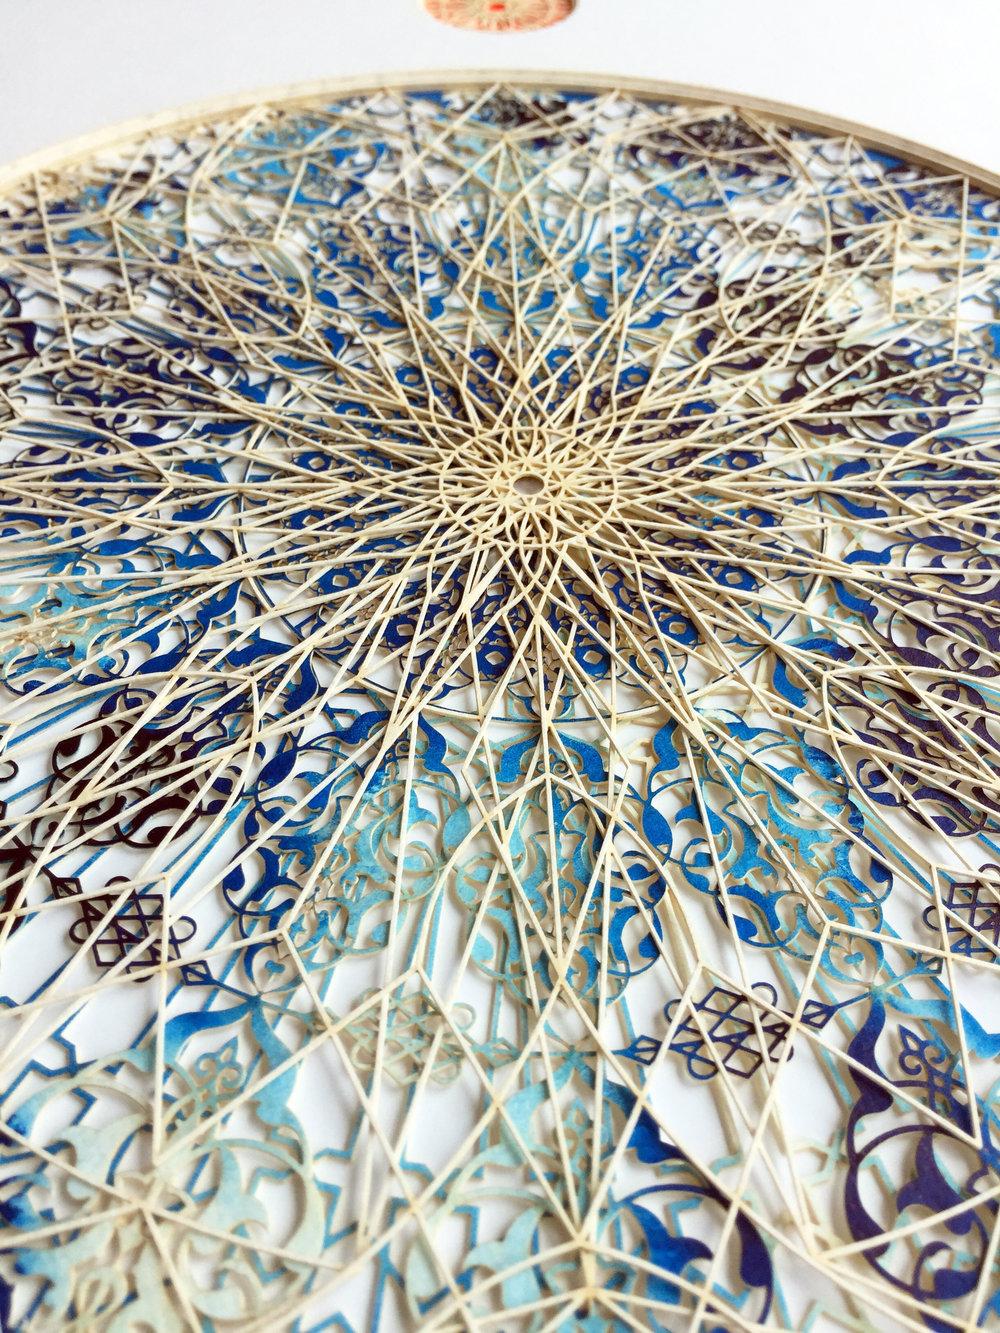 Julia Ibbini,  Araq Fades (Circle Studies) (detail) , 2017, 19 x 15 x 1.5 inches framed, photo courtesy of the artist